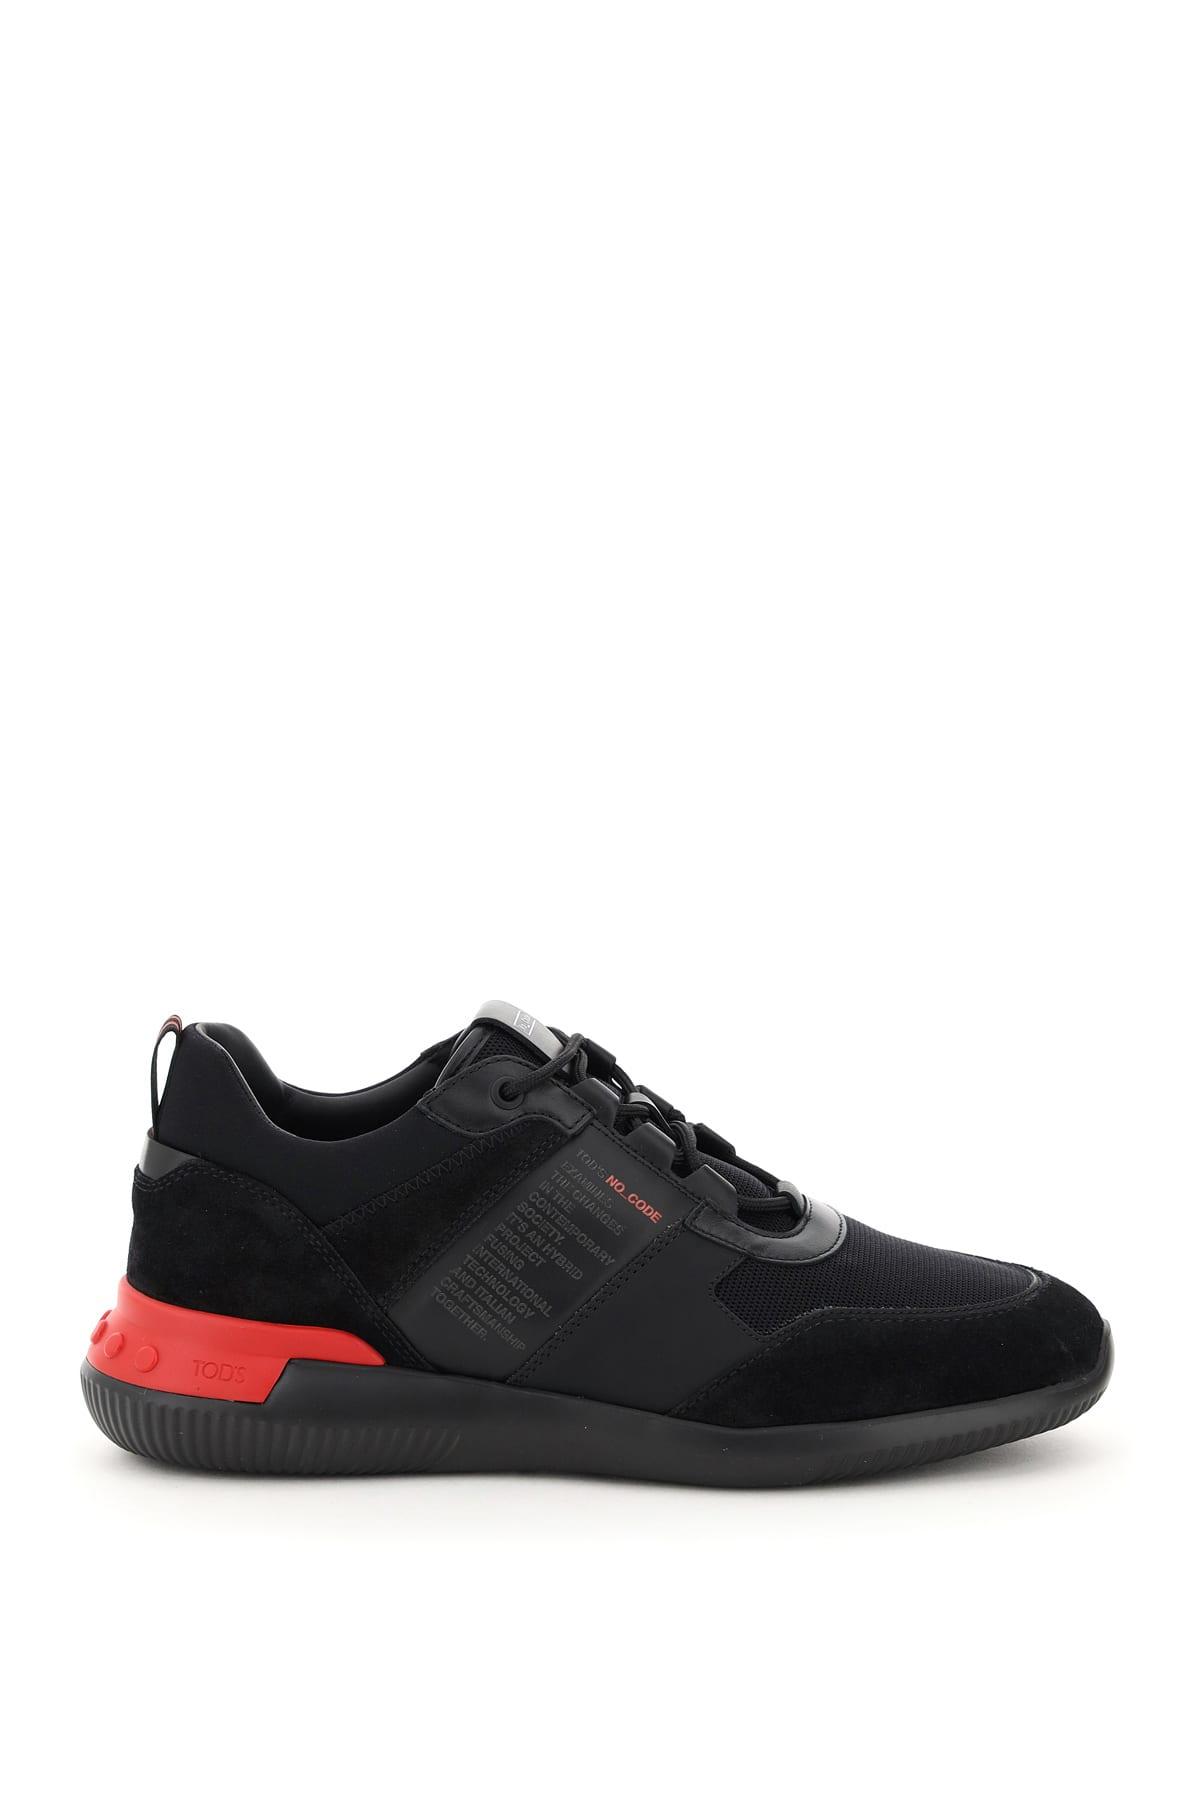 Tod's Sneakers NO CODE LIGHT 91B SNEAKERS